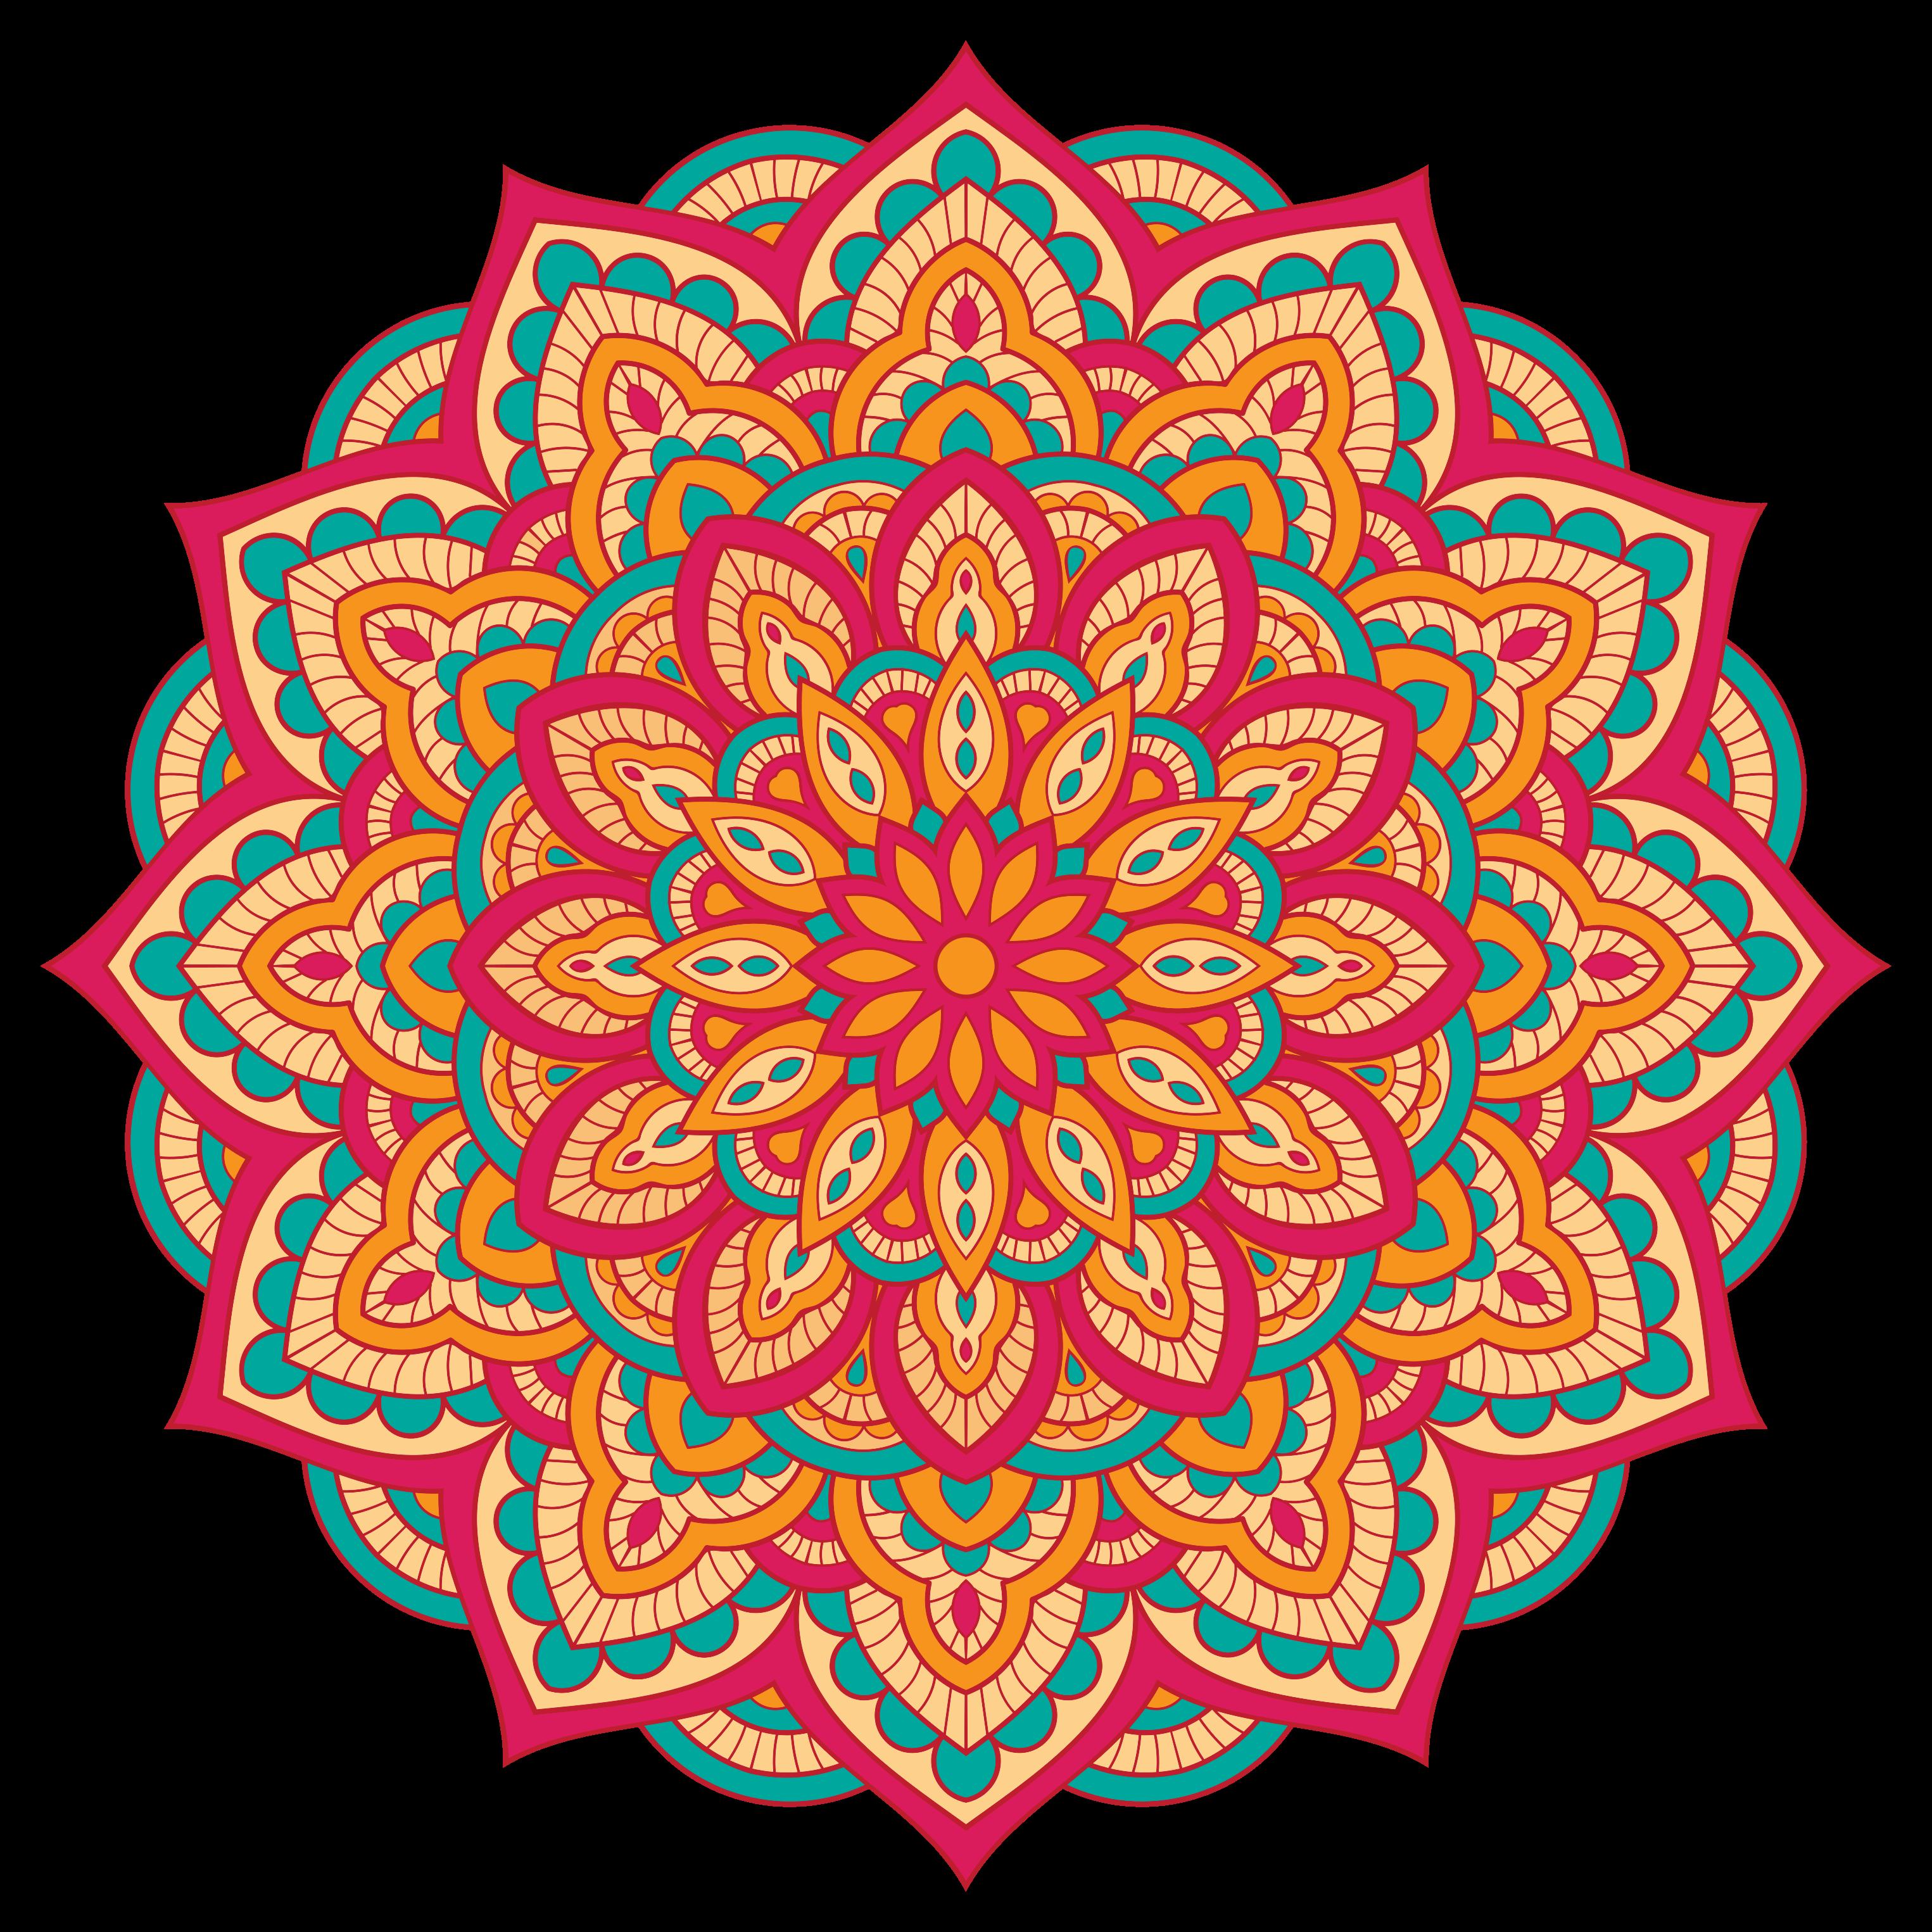 TenStickers. πολύχρωμο χαλί μάνταλα. ένα πολύχρωμο σχέδιο με μάνταλα σε πολλά χρώματα που θα γεμίσουν το σπίτι σας, το σαλόνι σας, το υπνοδωμάτιο ή την τραπεζαρία σας με μεγάλη χαρά.